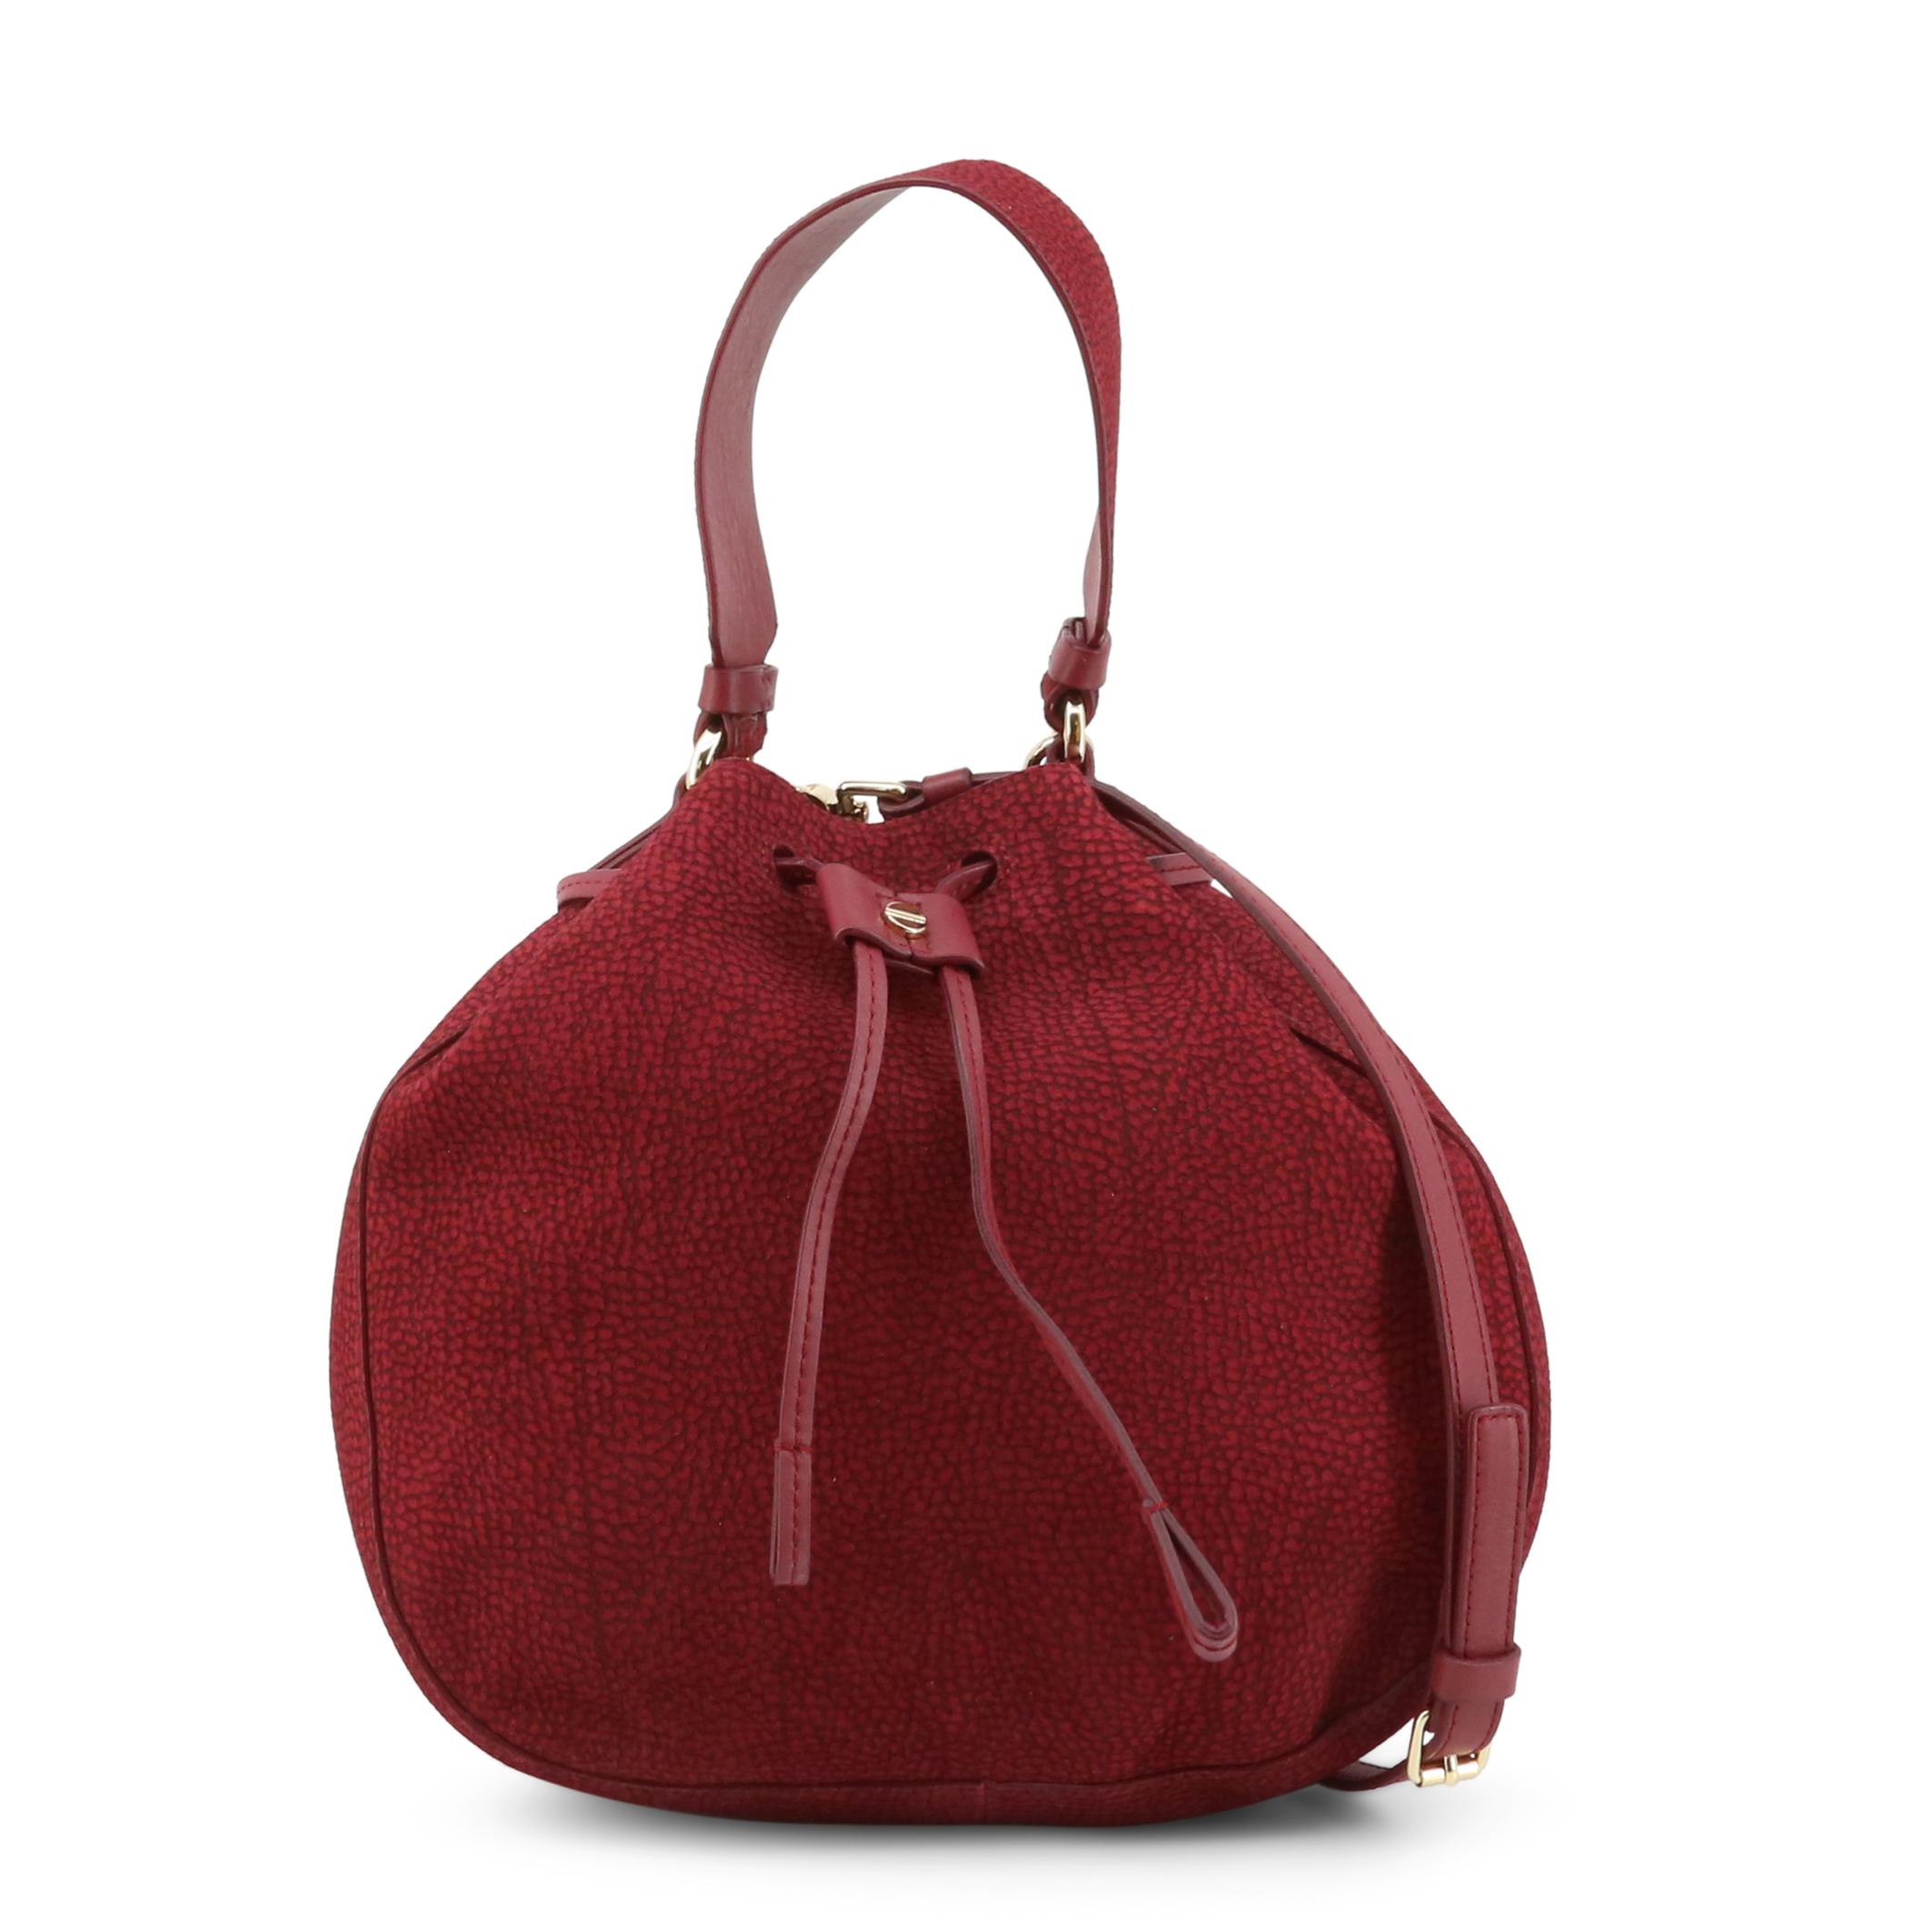 Borbonese - 913266-688 - Red